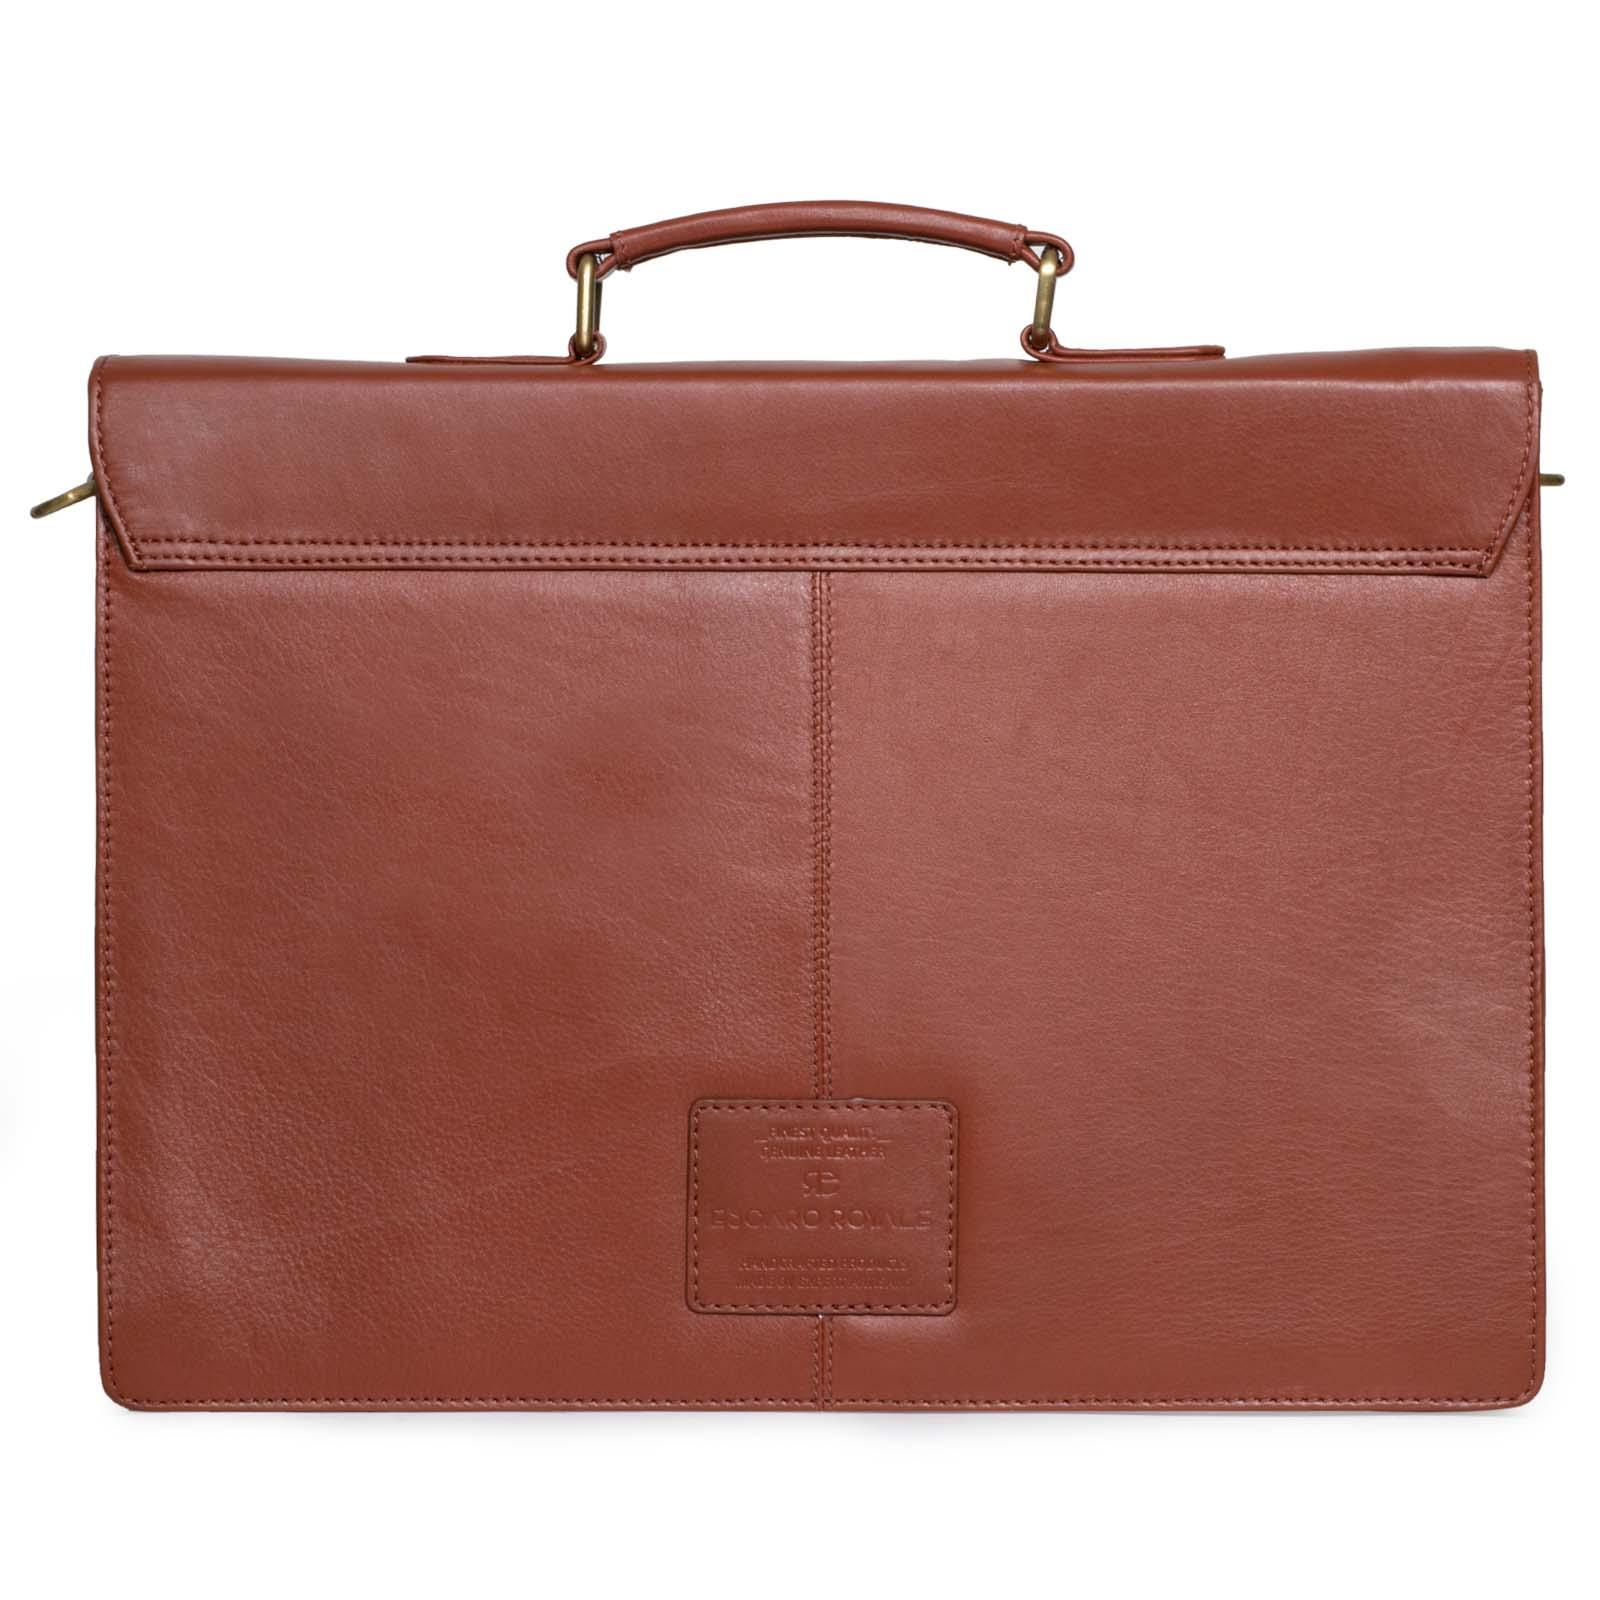 Tan Leather Portfolio Bag